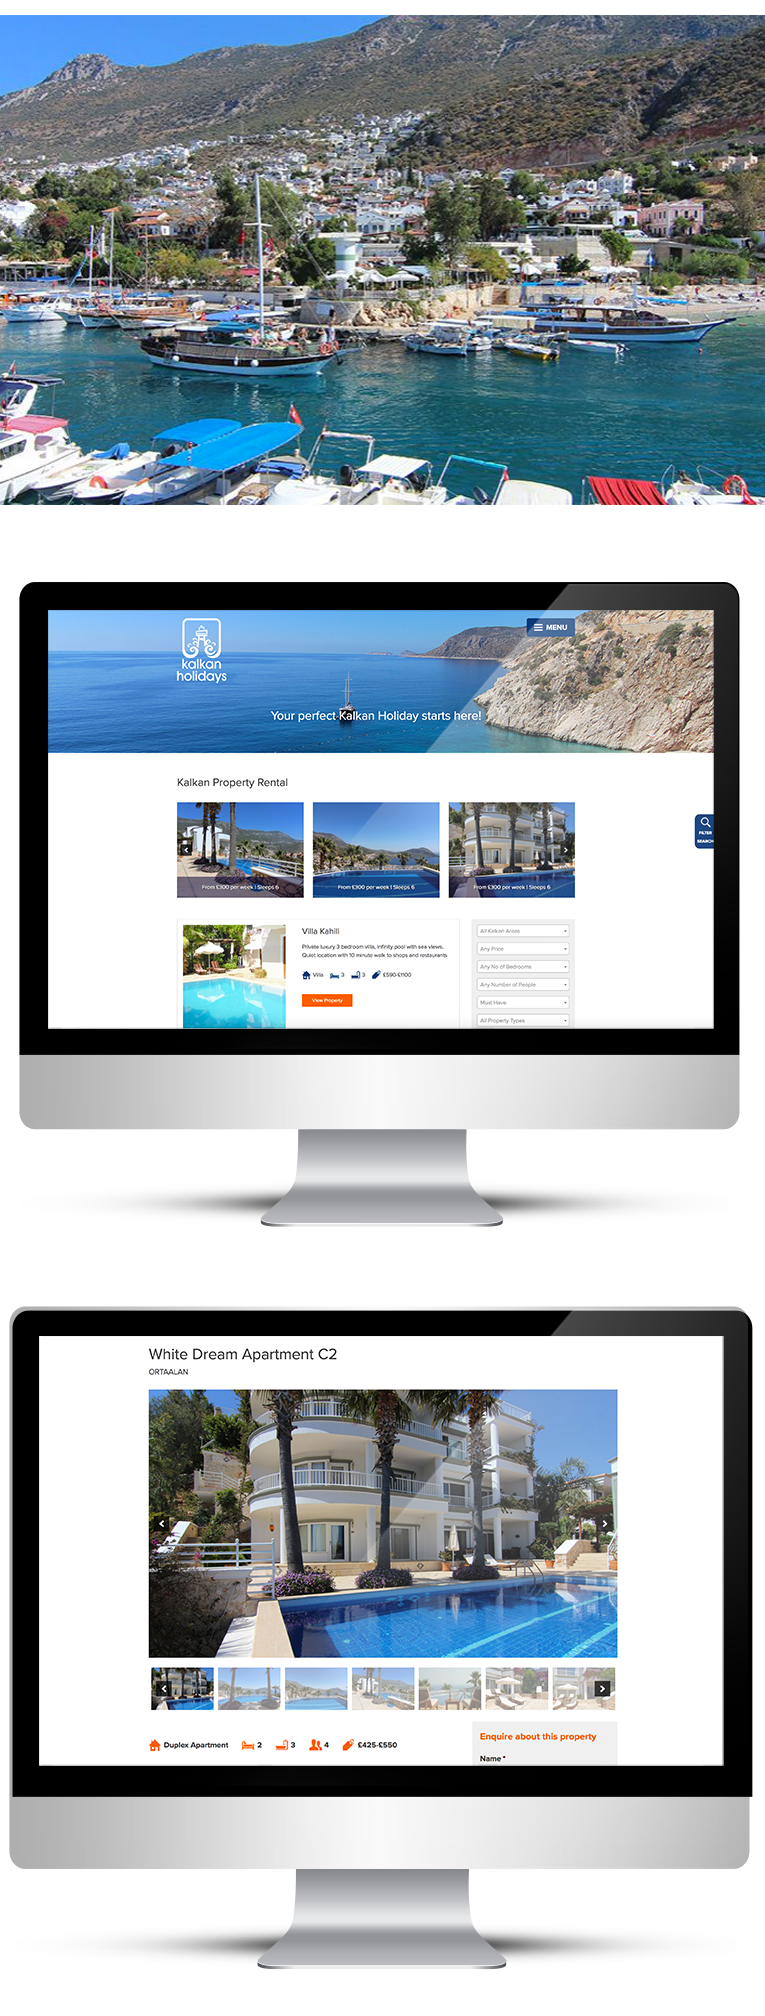 Desktop version, web design for Kalkan Holidays